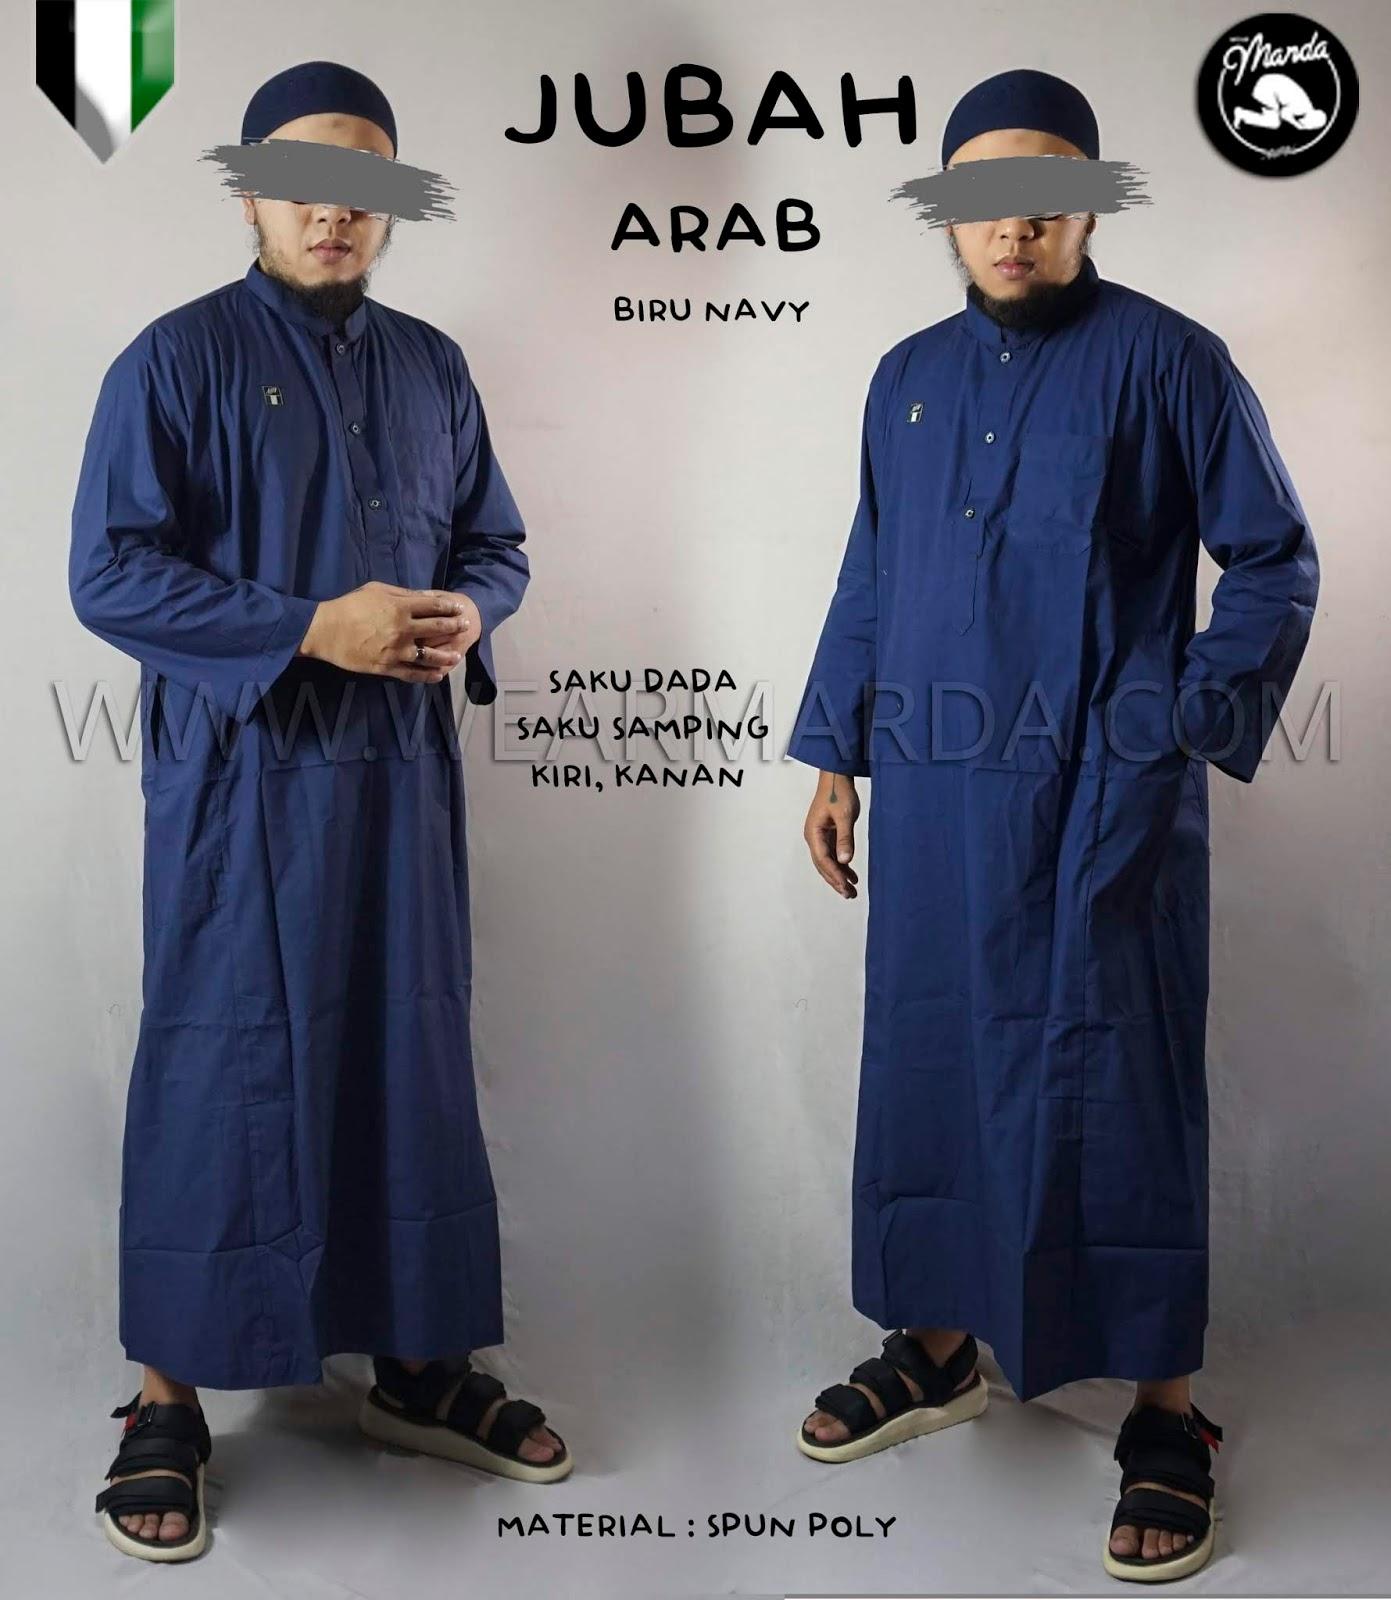 JUBAH ARAB BIRU NAVY